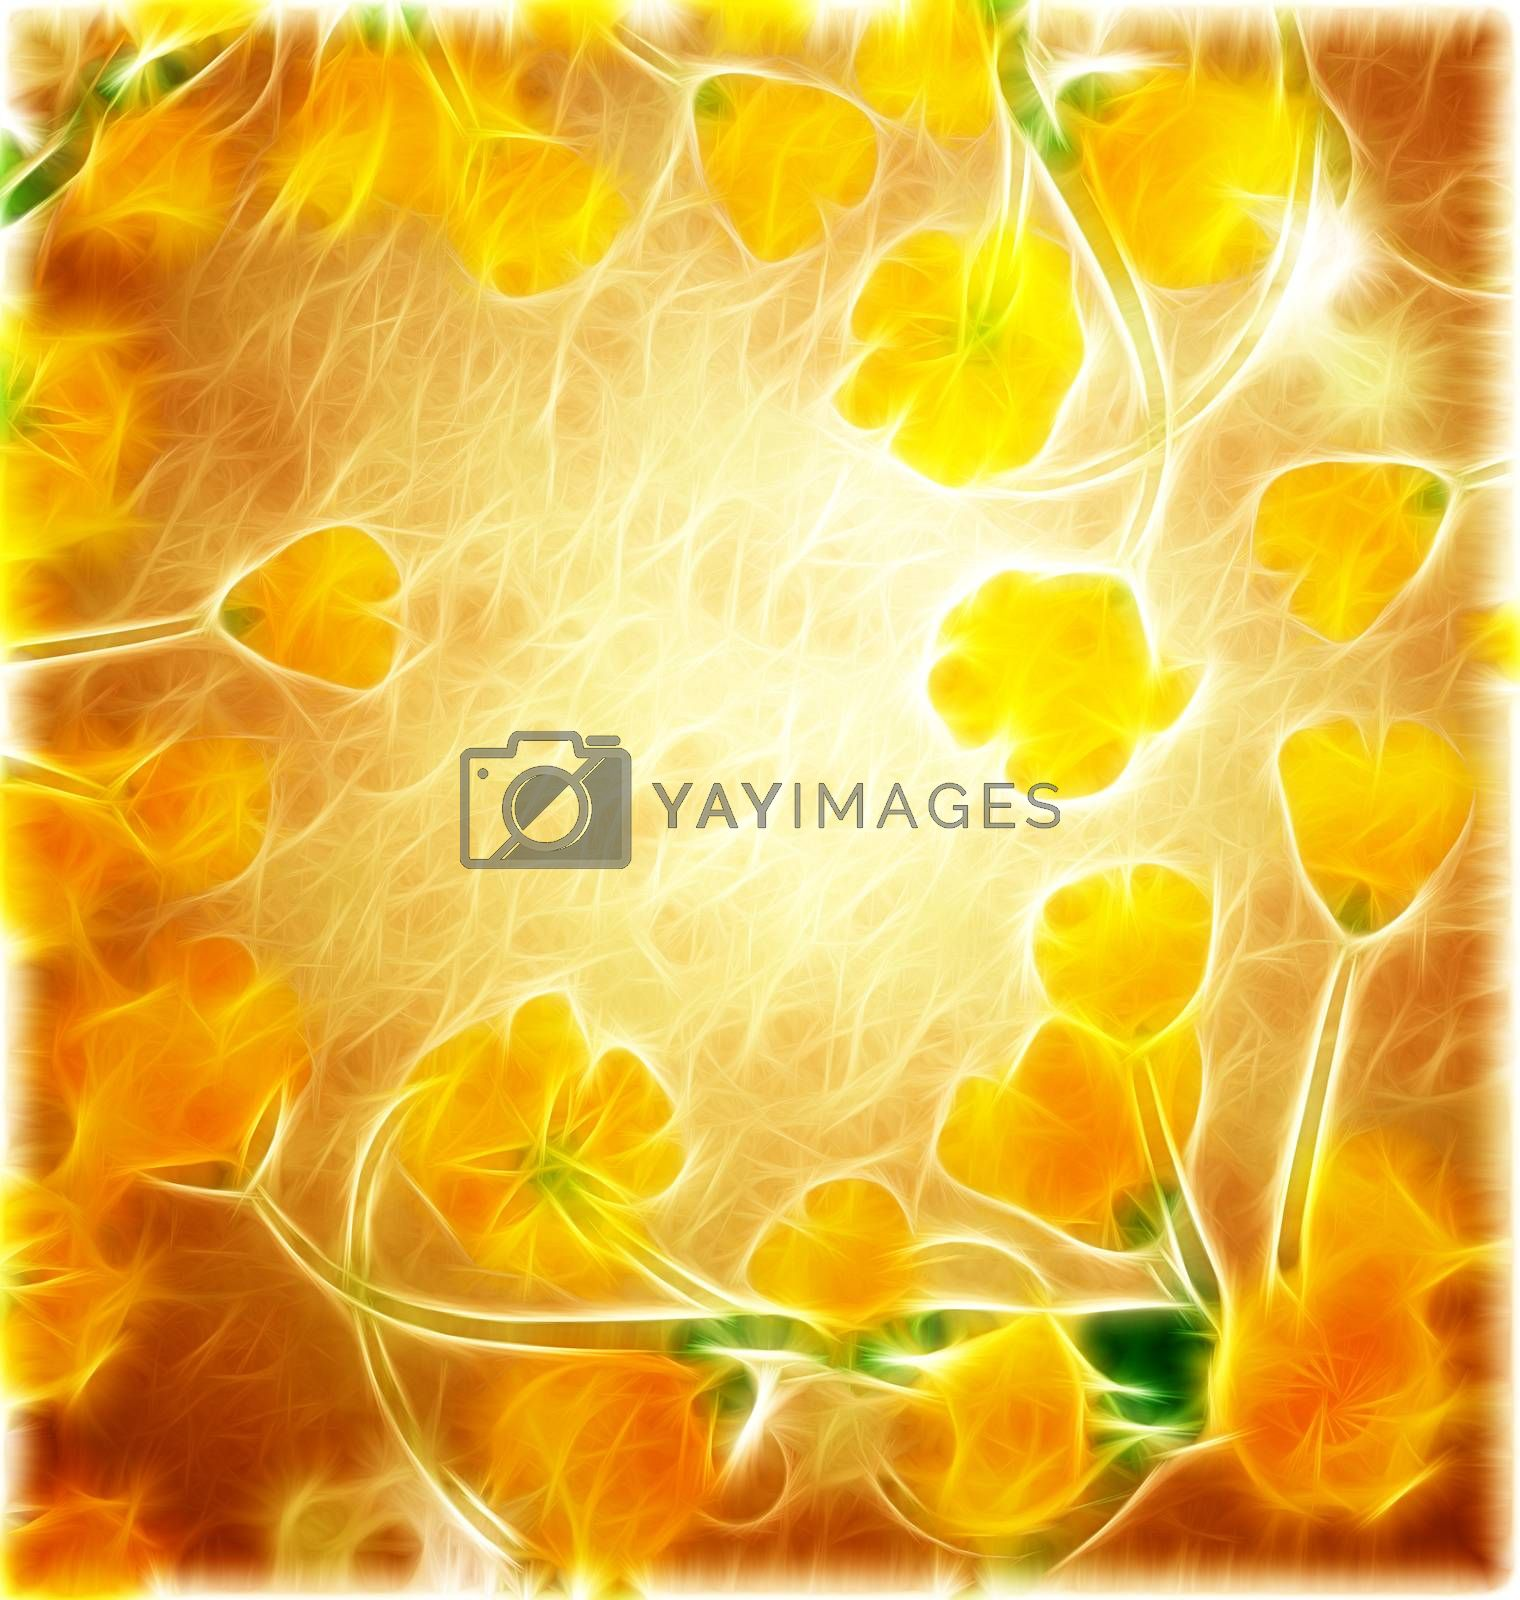 Royalty free image of yellow grunge nature illustration by CherJu